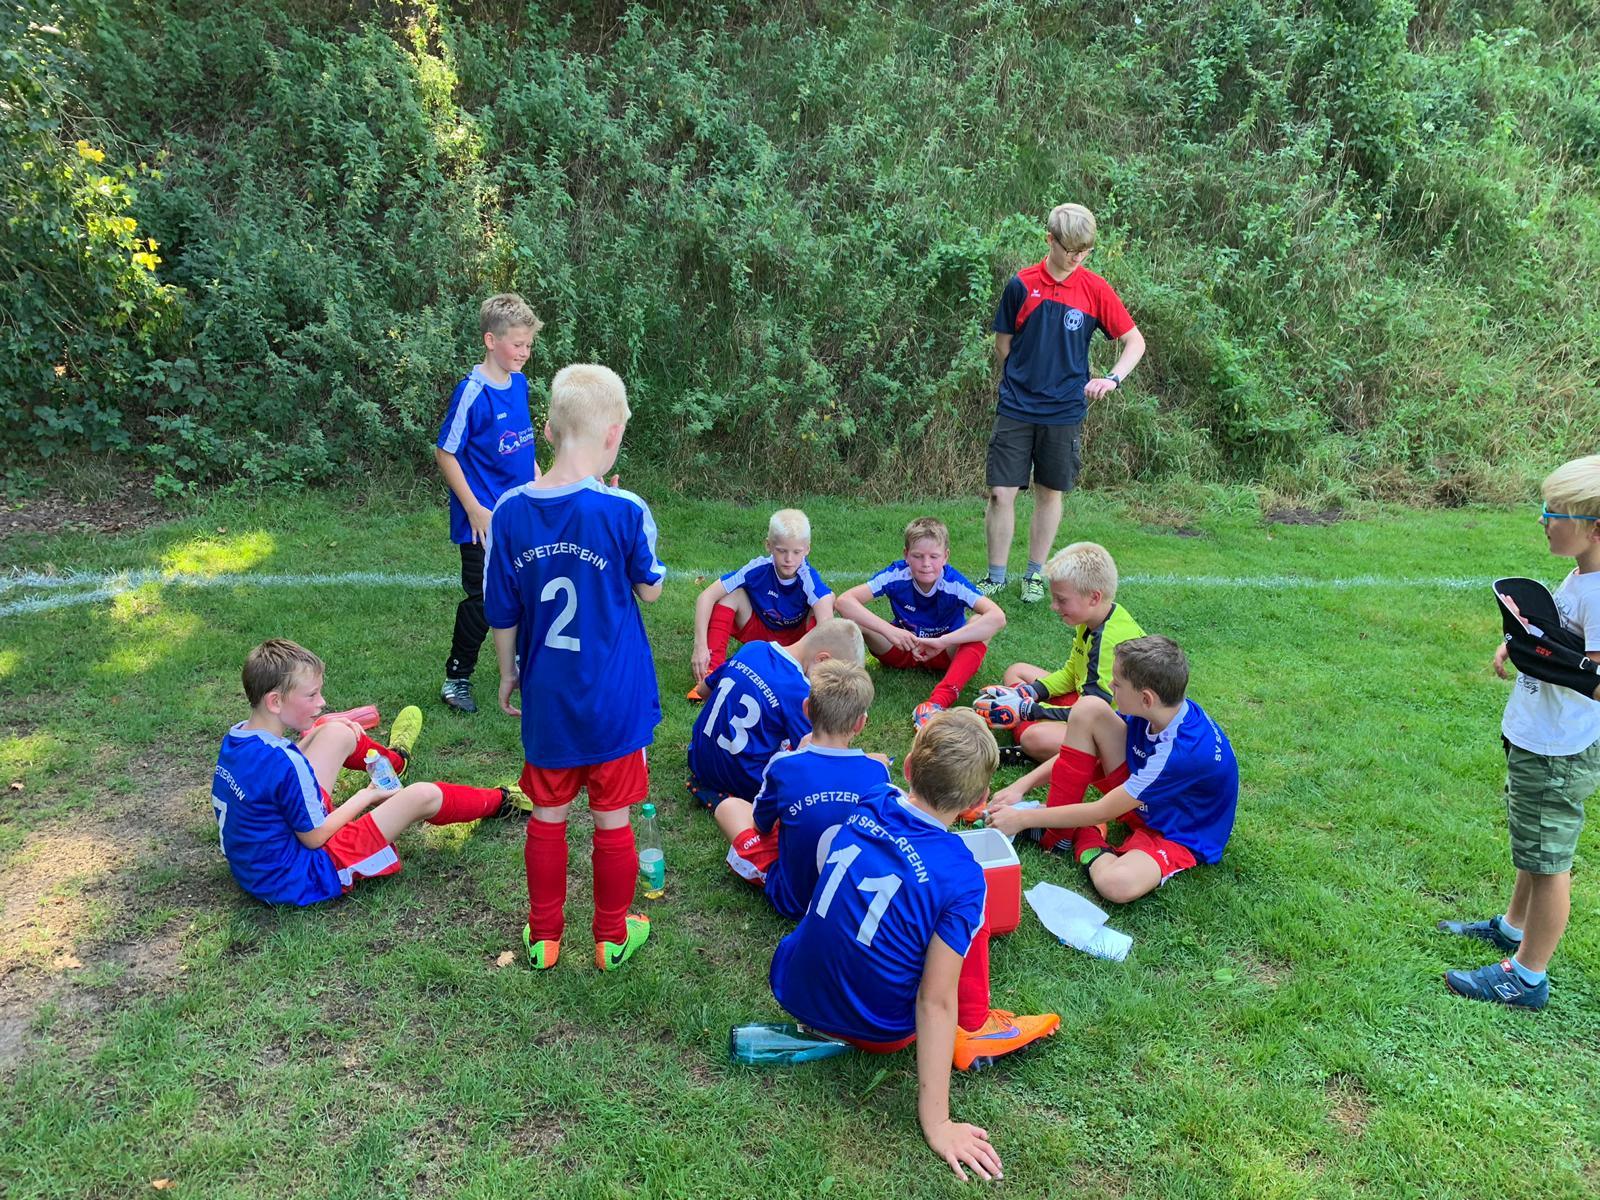 Liga-Spiel in Uplengen